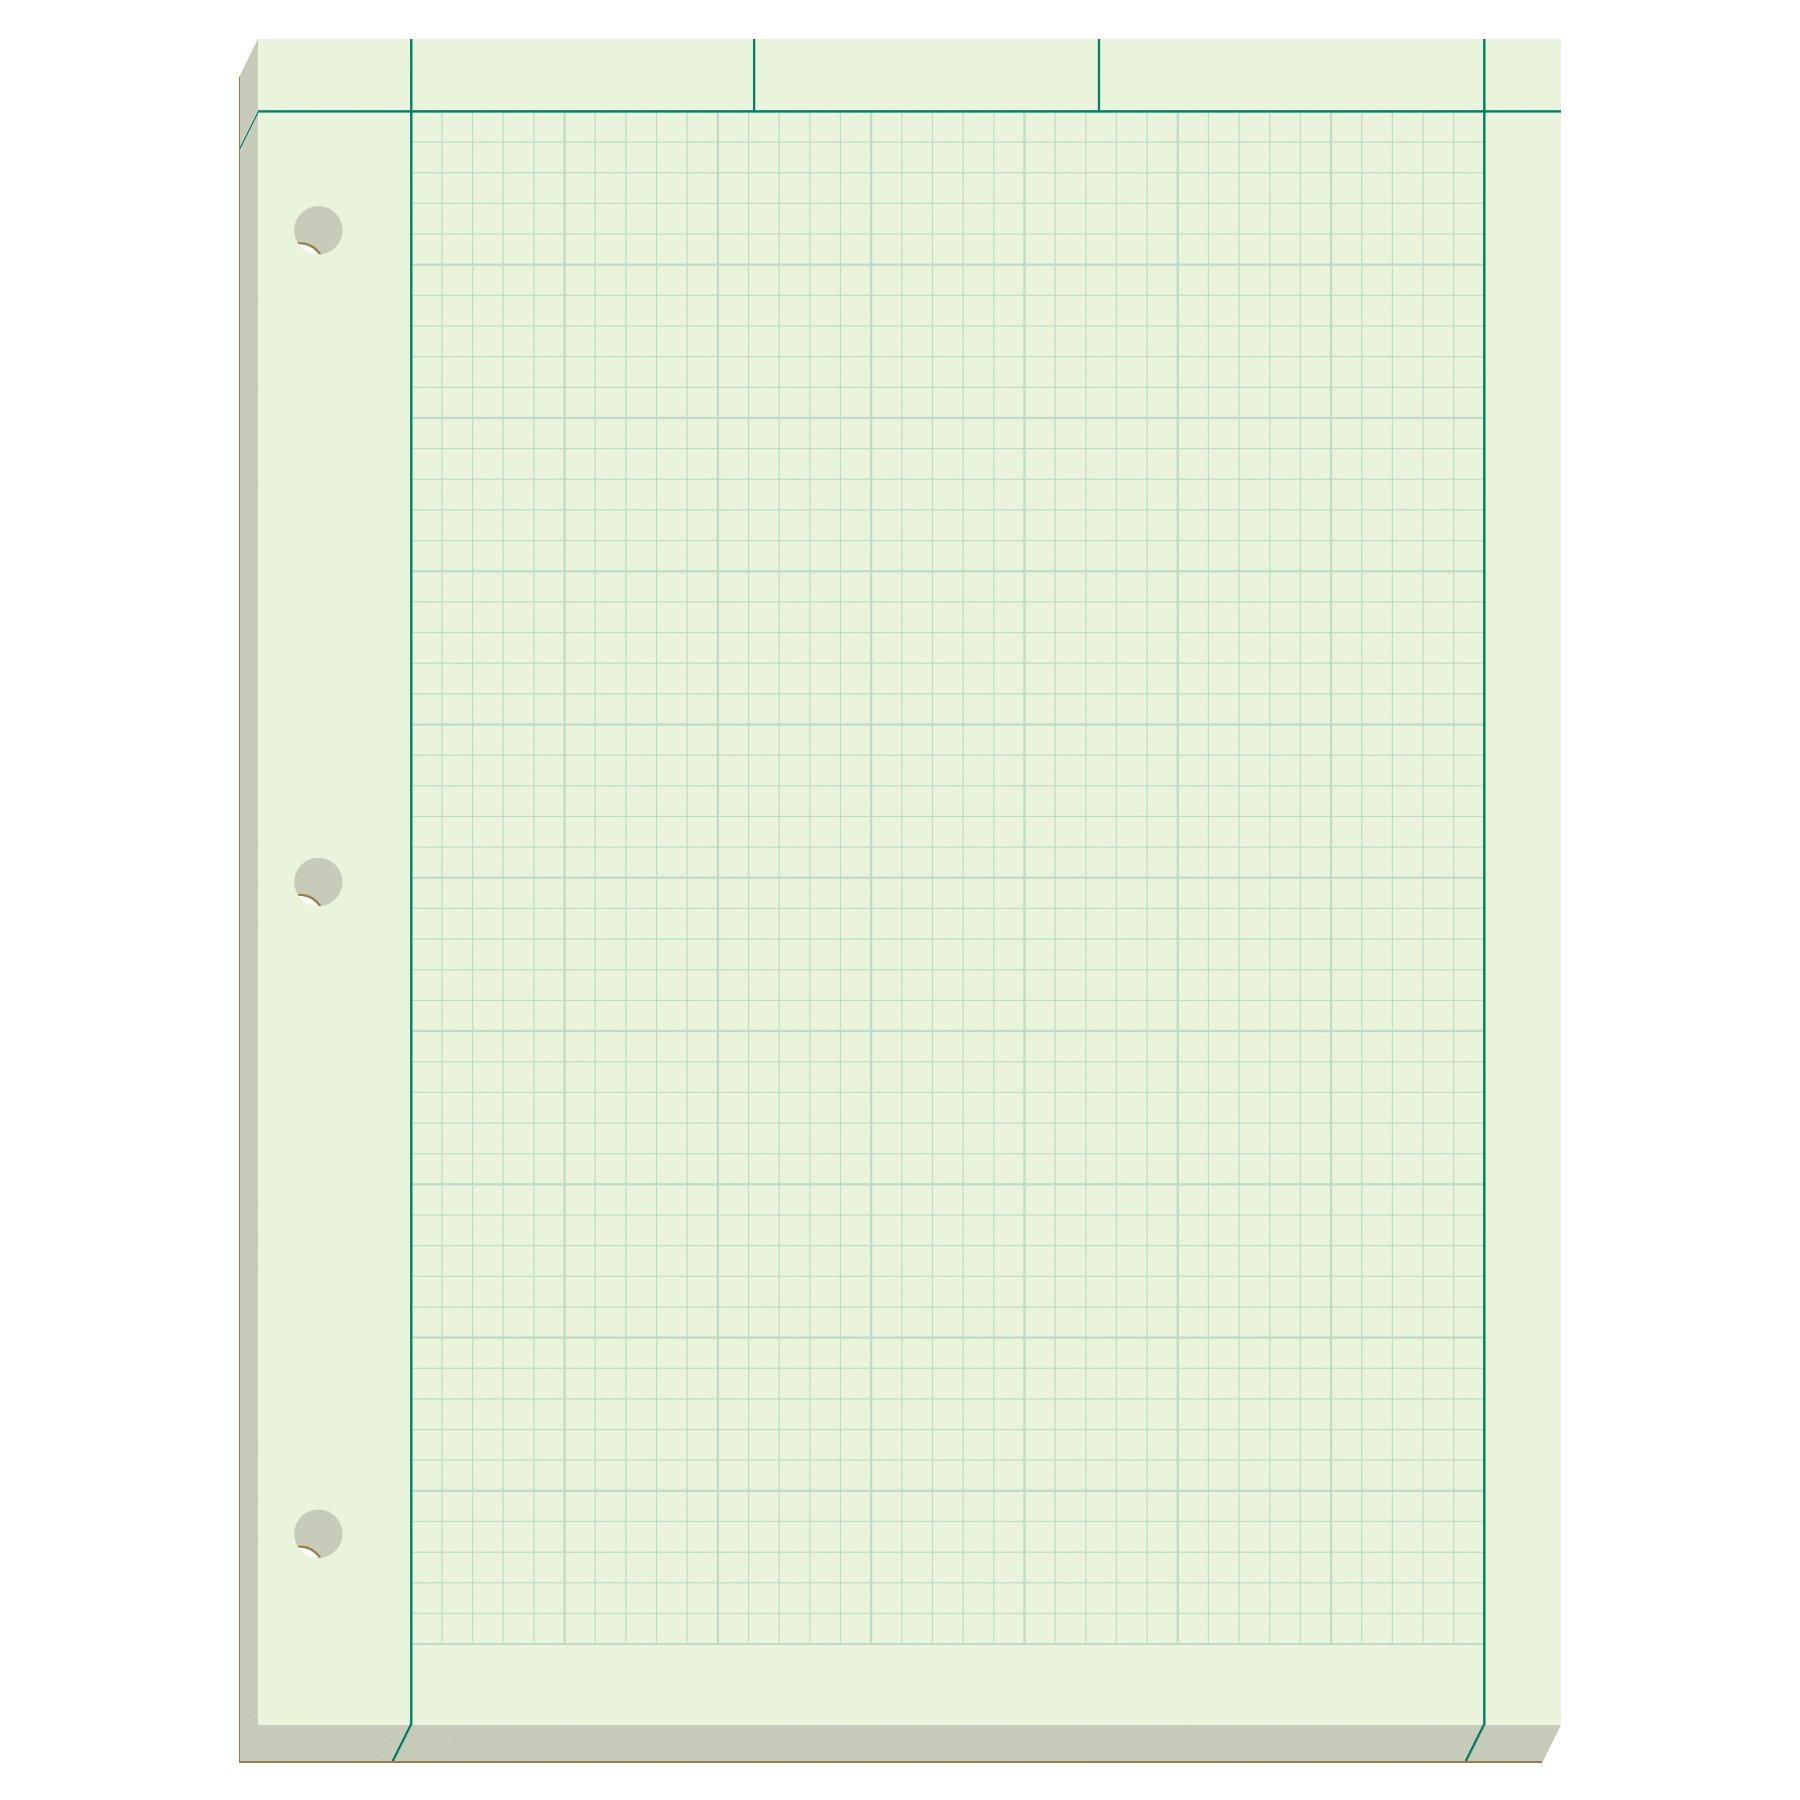 Ampad Engineer Pad, 5 Squares per Inch, 8.5'' x 11'', 200 Sheet Pad, Green (22-144)